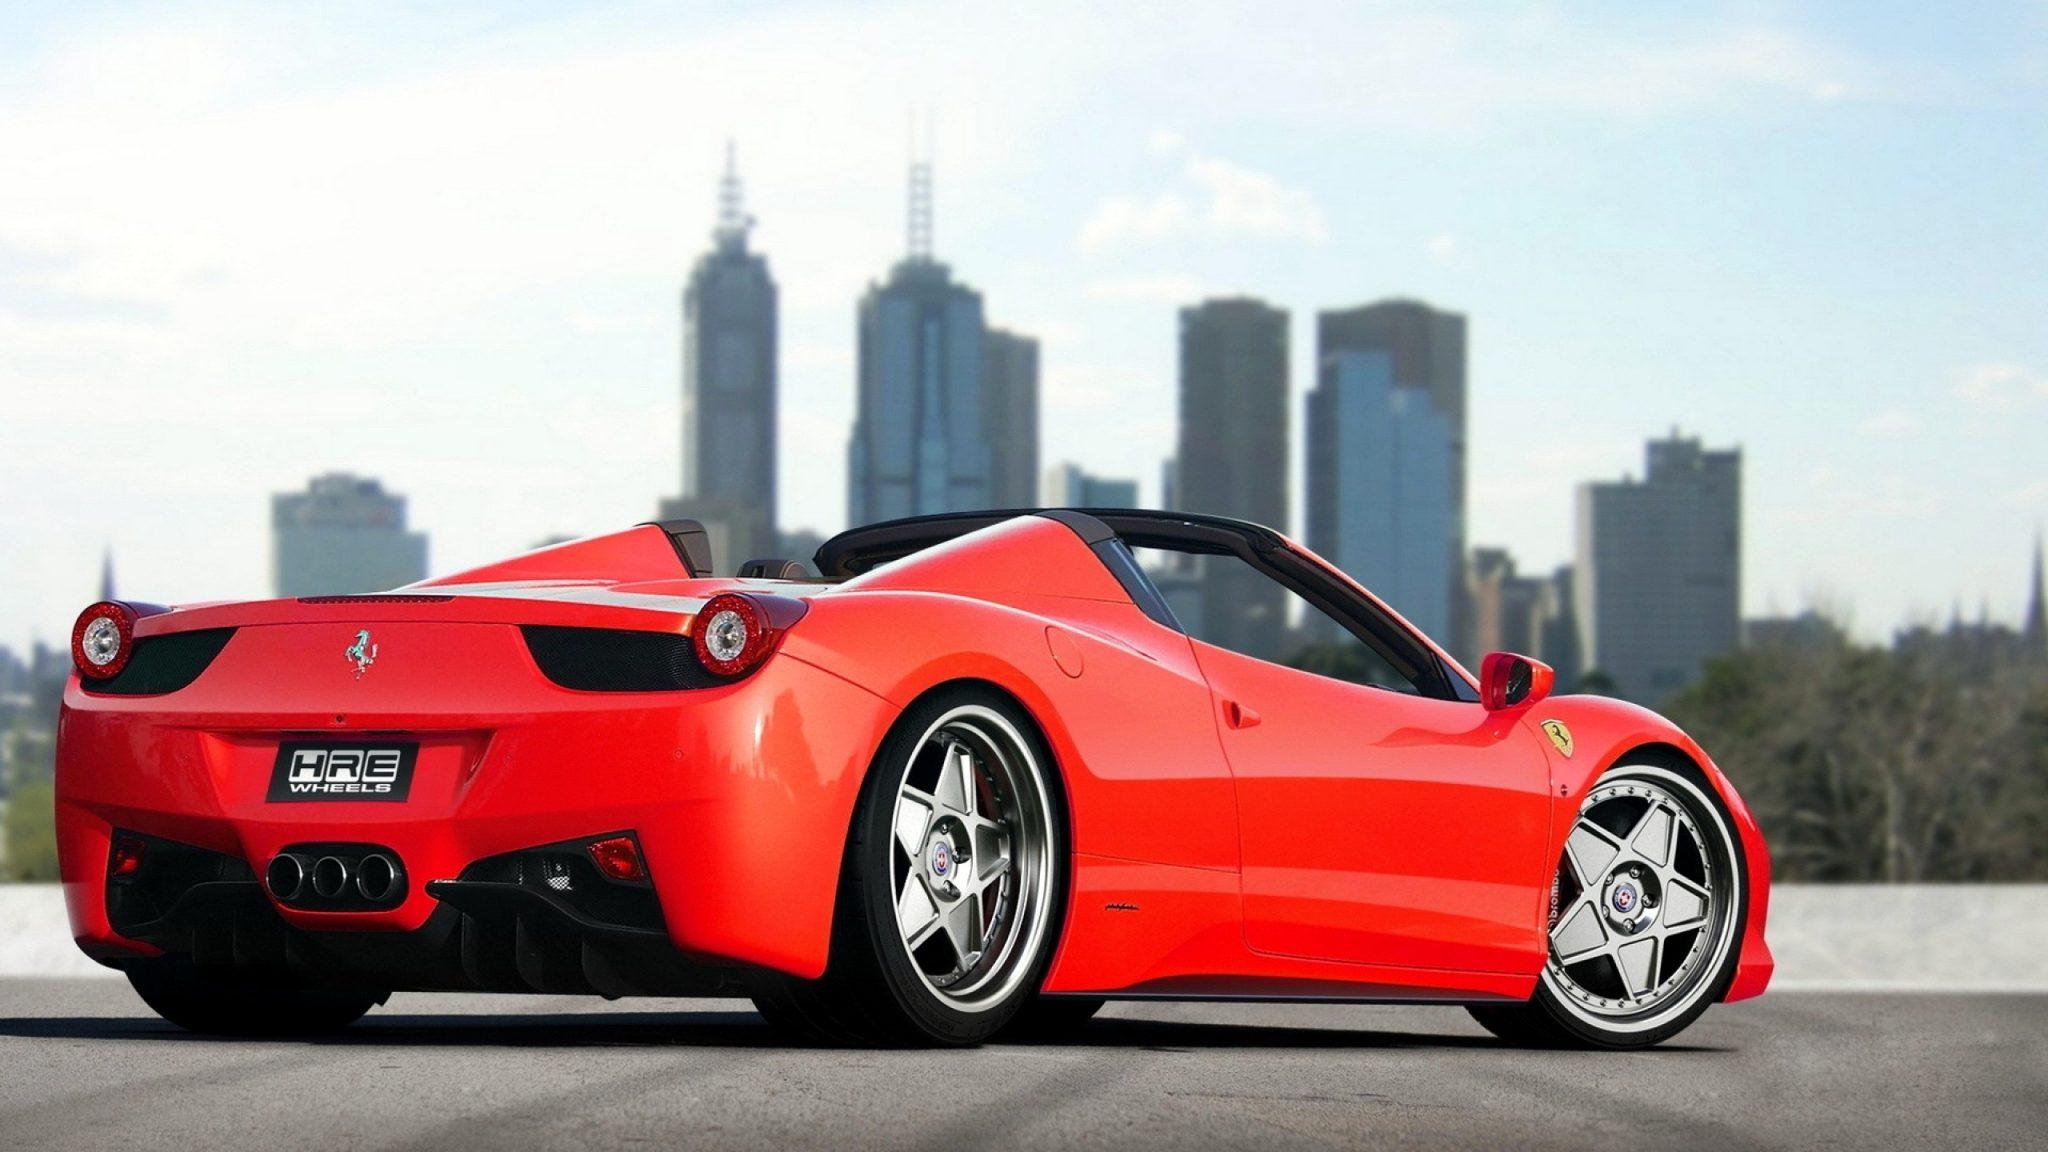 Free Download Ferrari 458 Italia Spider Full Hd Wallpaper